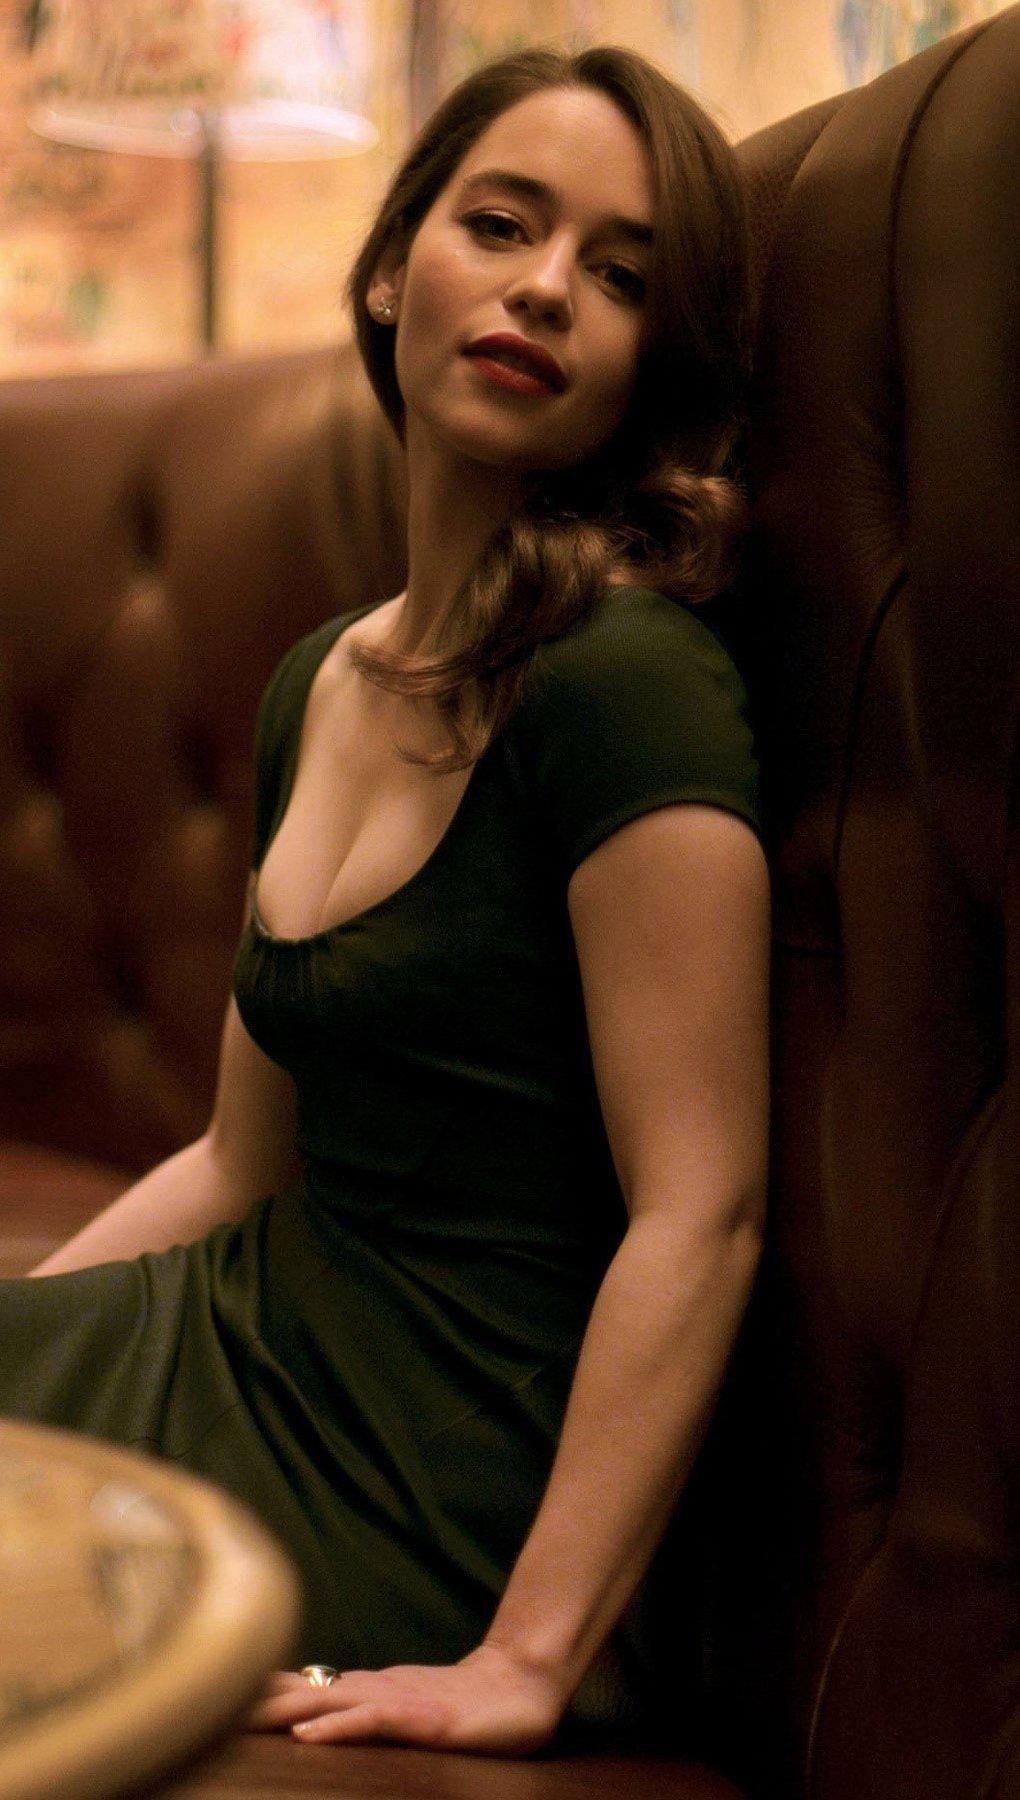 Wallpaper Emilia Clarke 2014 Vertical